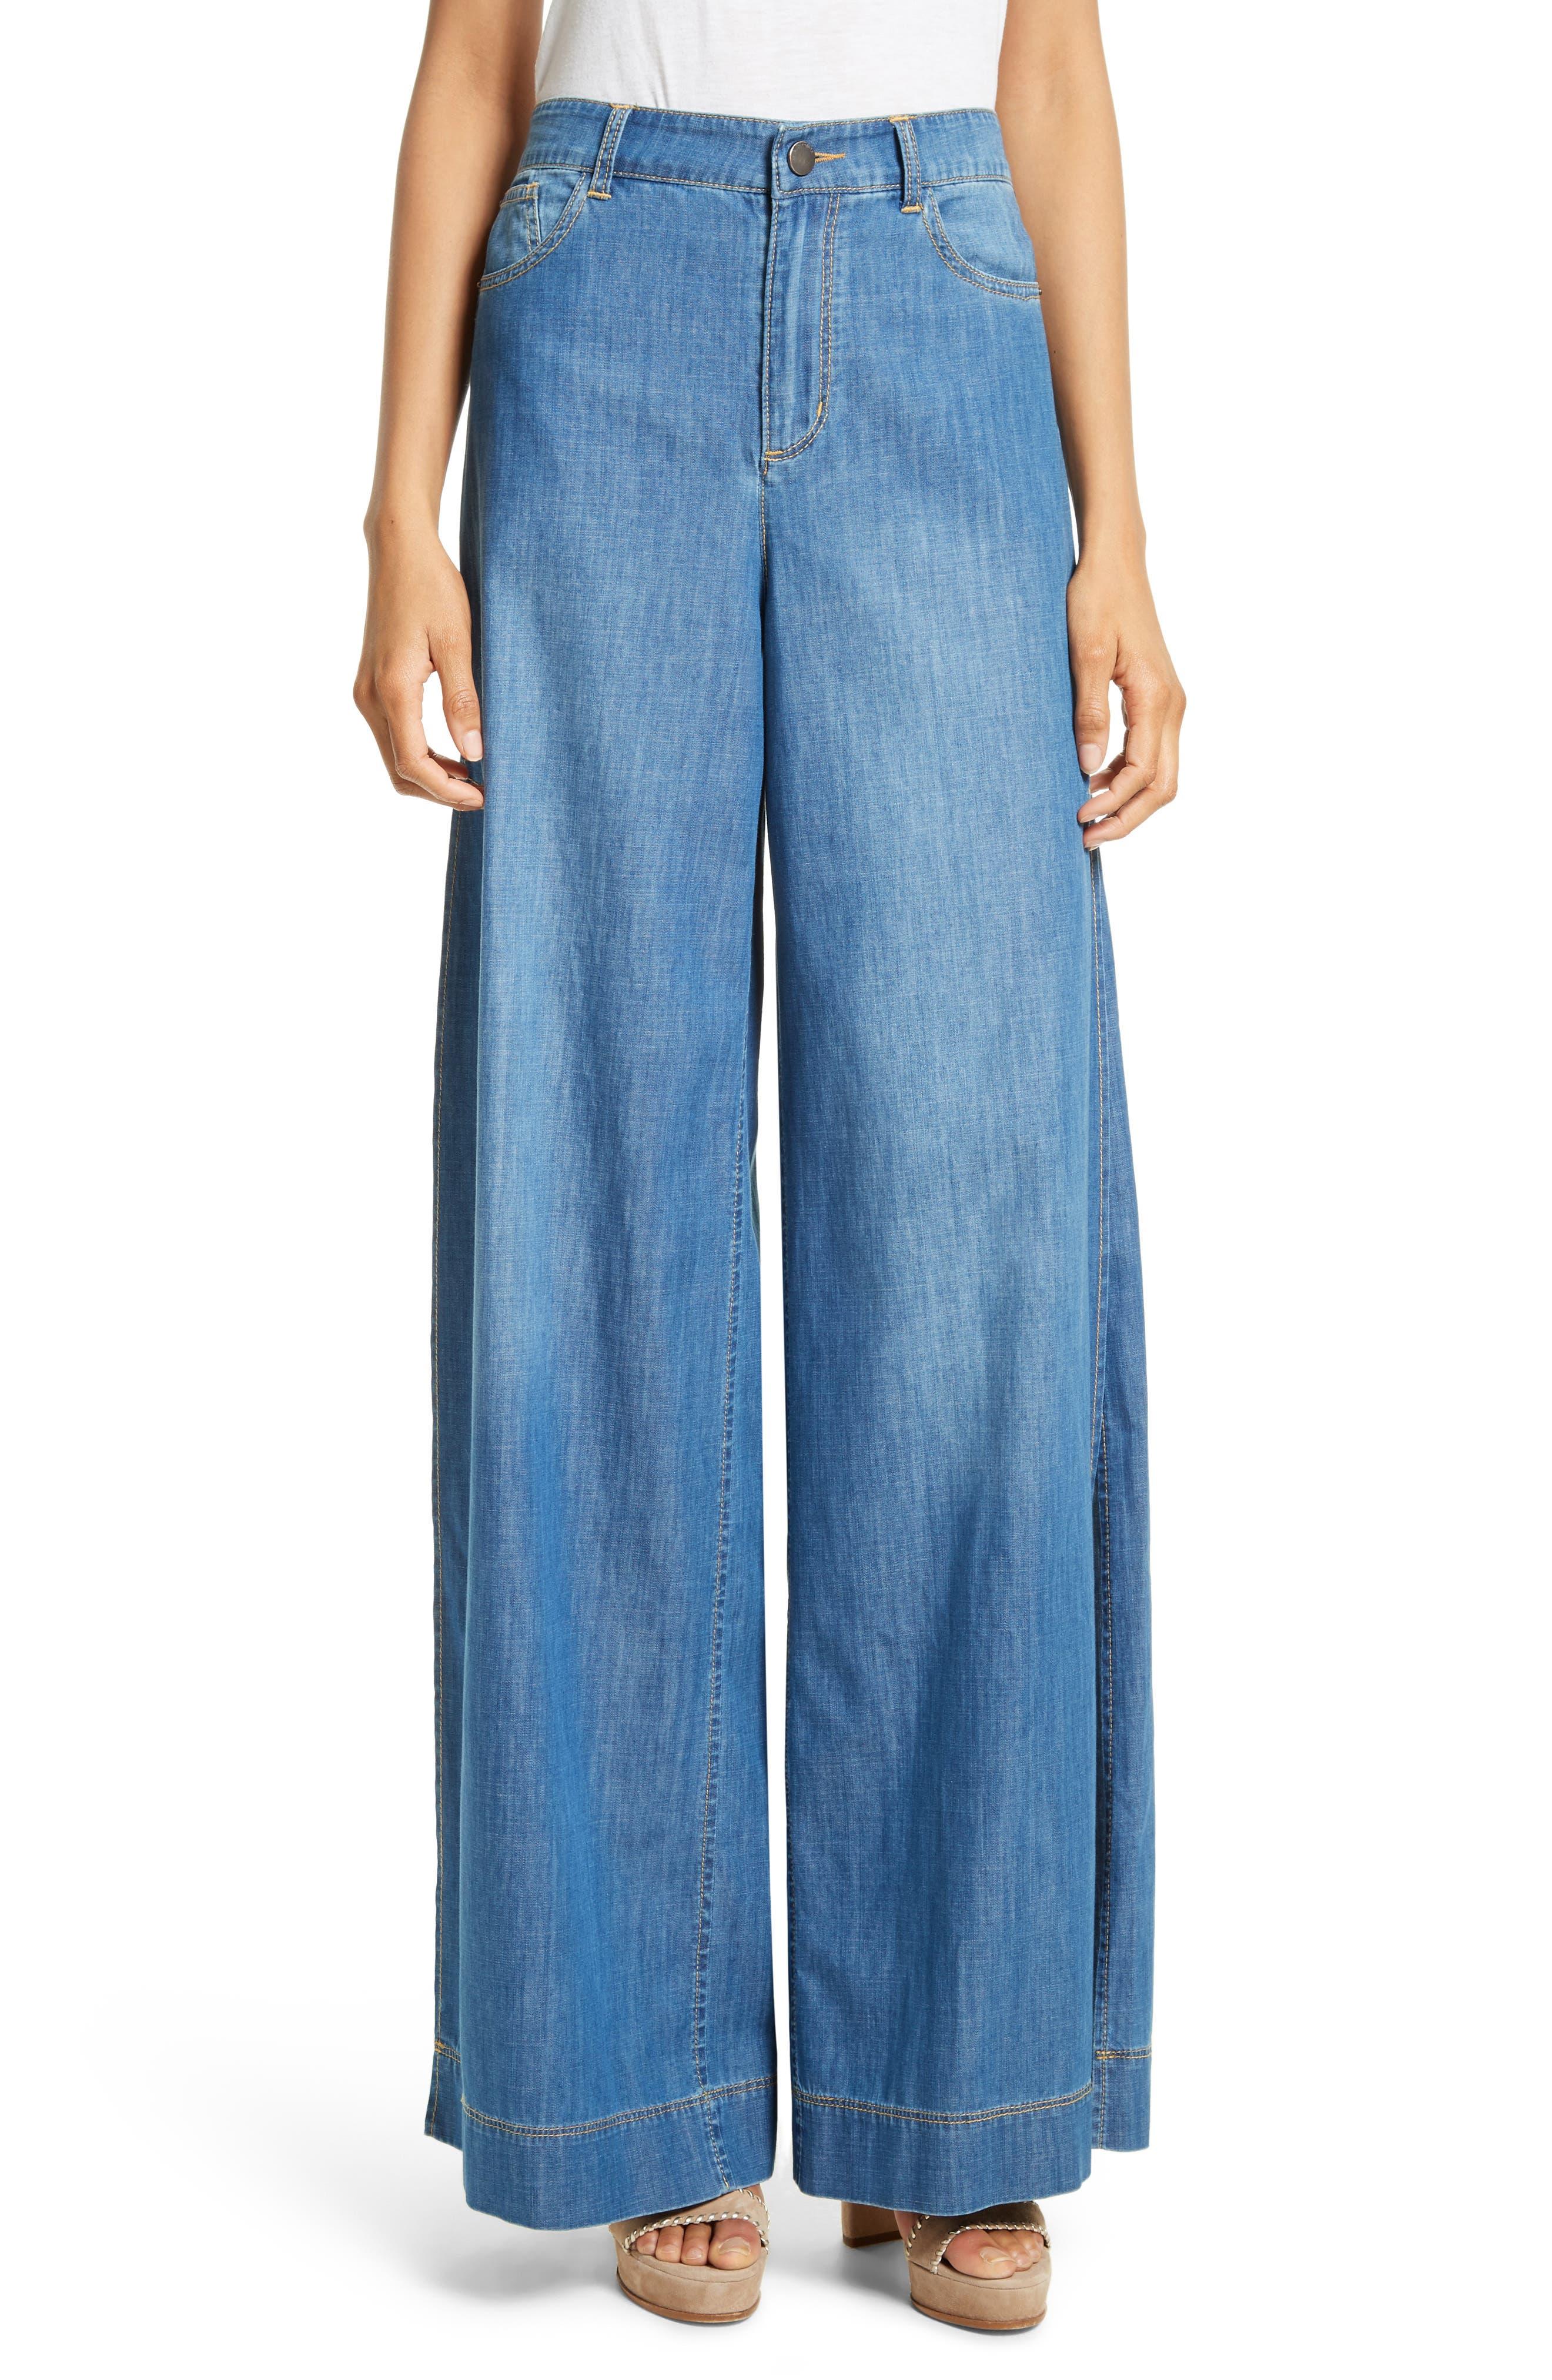 Clarissa Side Slit Wide Leg Jeans,                         Main,                         color, Vintage Wash